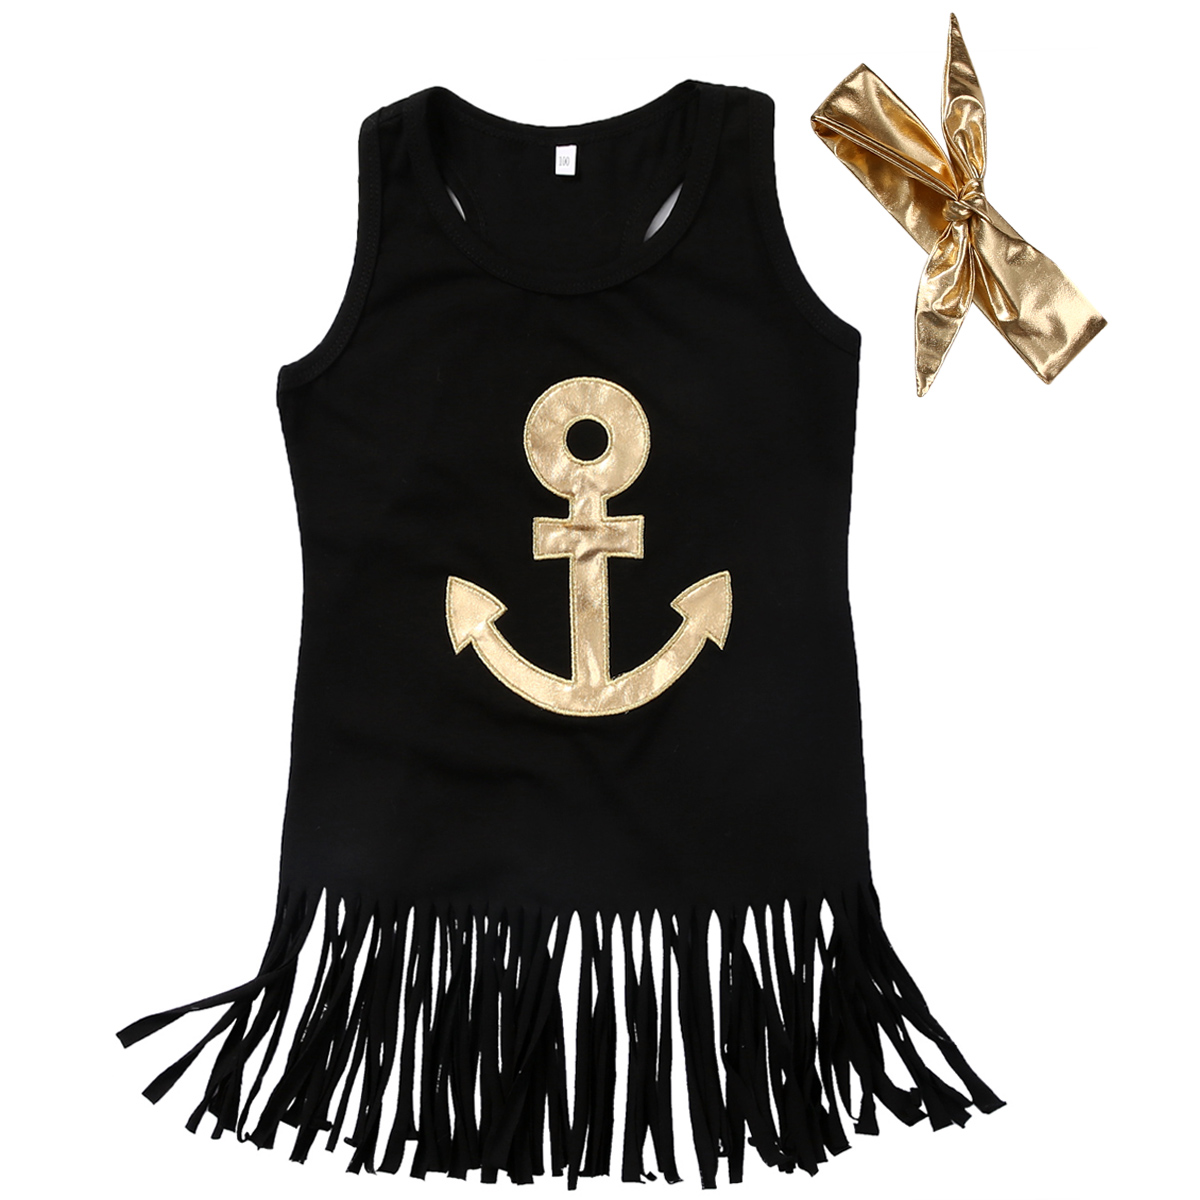 Fashion Baby Girls Toddler Kids Black Sleeveless Anchor Tassel Dress+Headband Casual Party Wedding Dress<br><br>Aliexpress